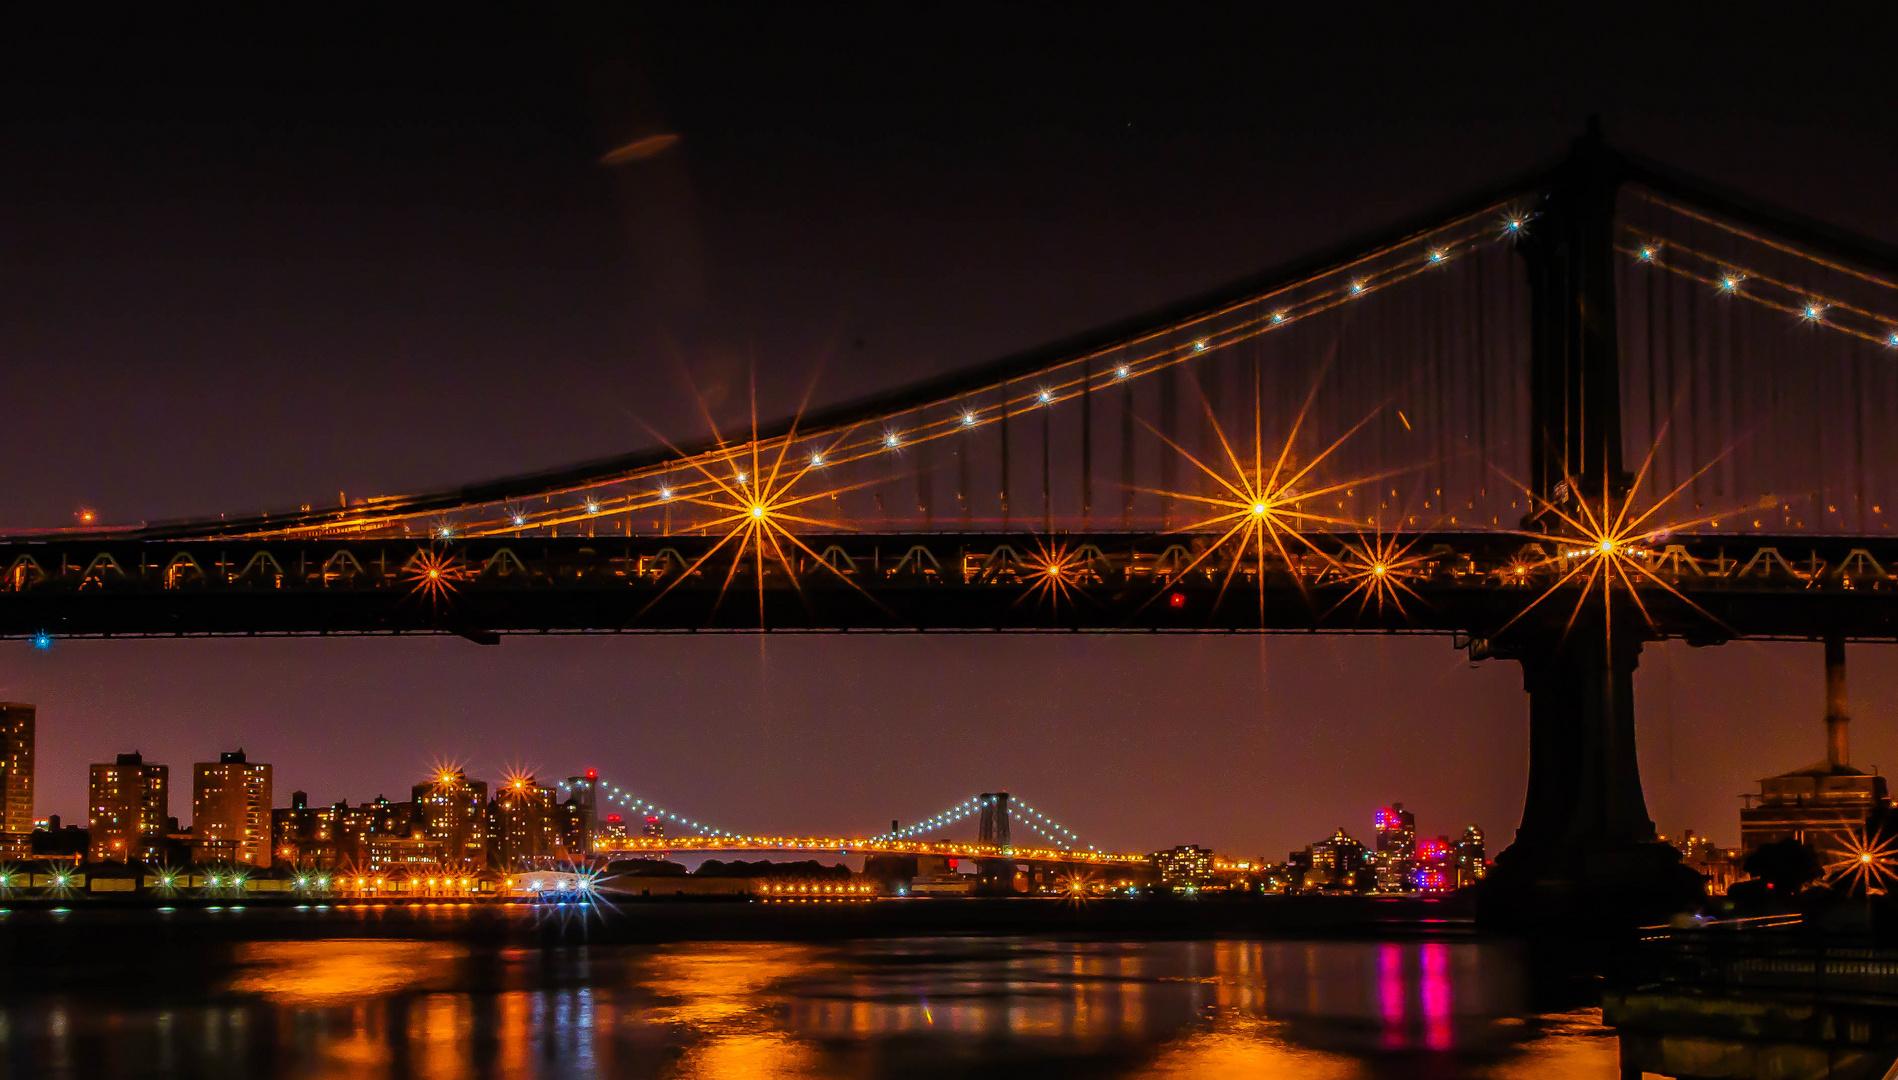 Bridges in NYC at Night